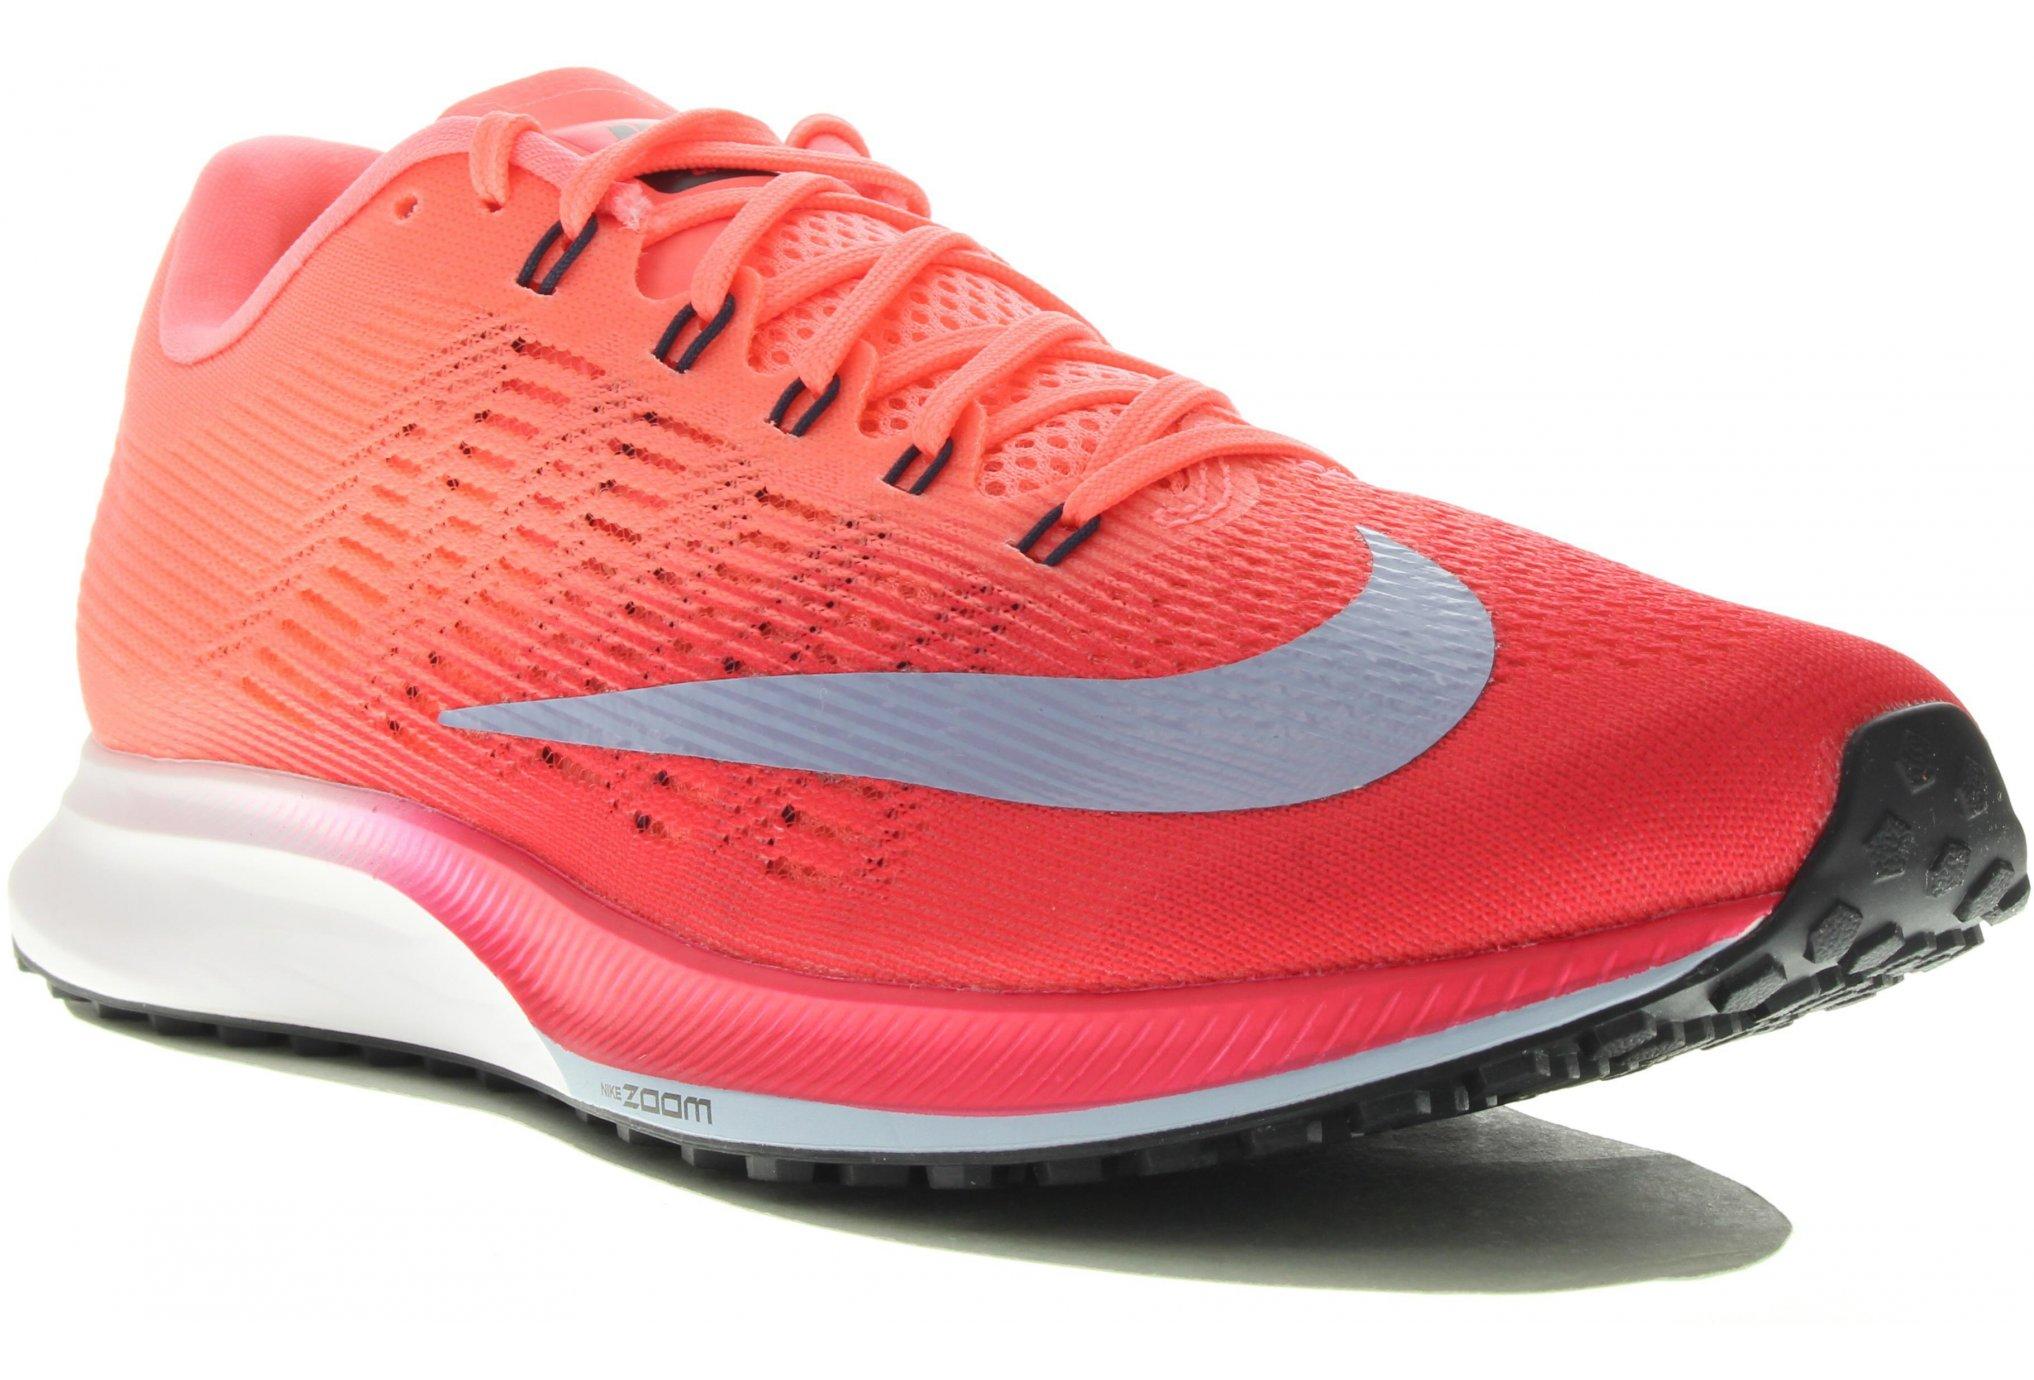 Nike Air Zoom Elite 9 W Chaussures running femme